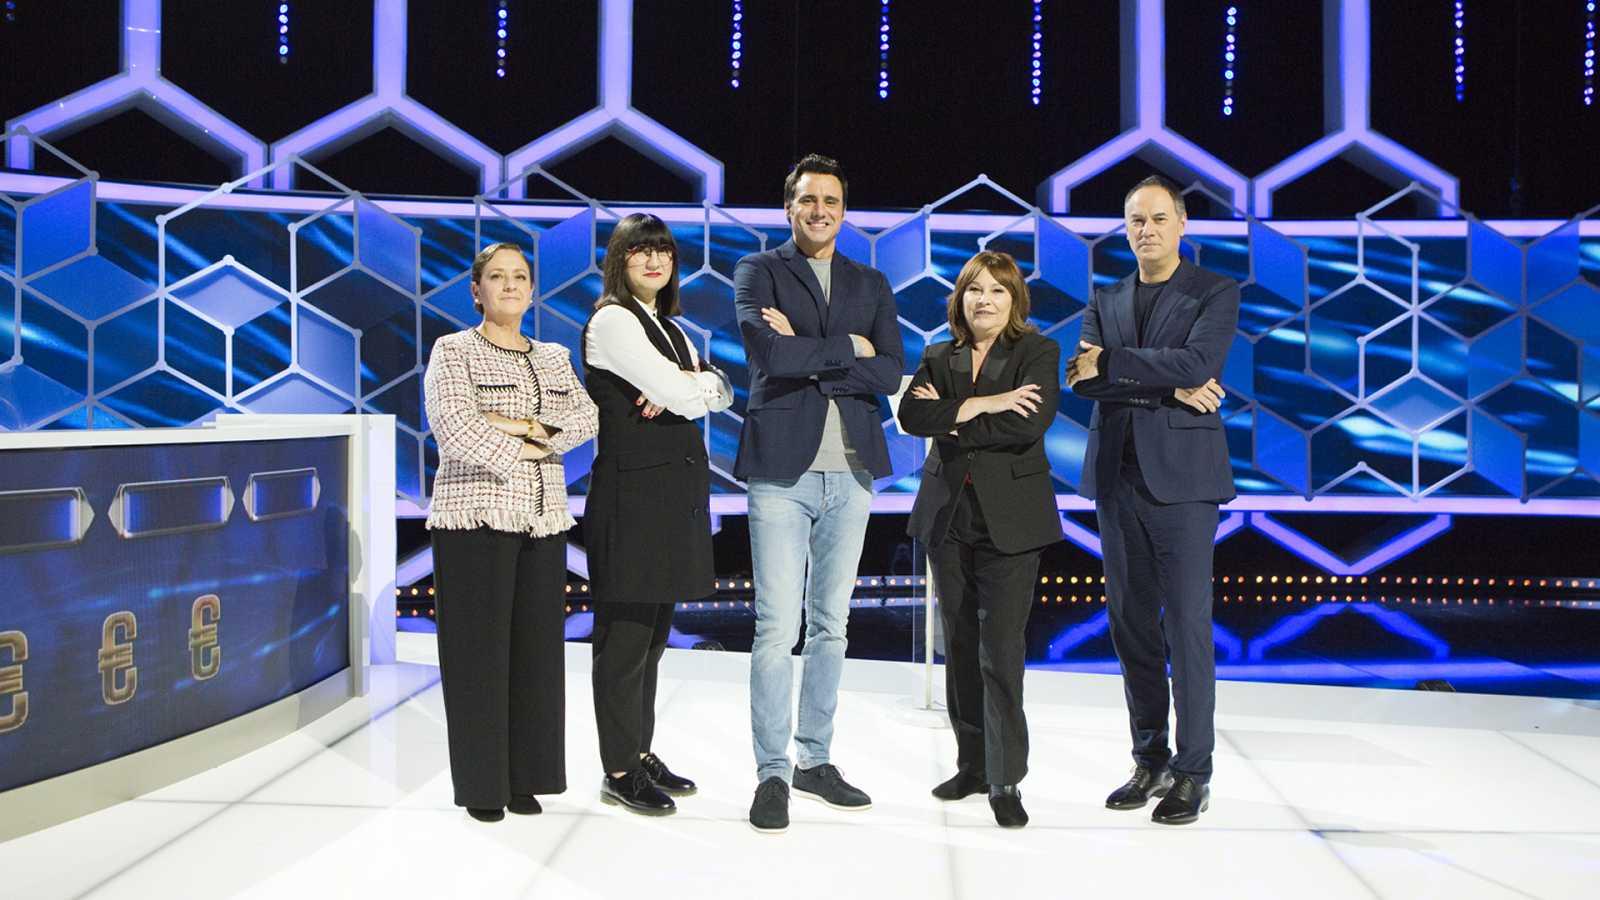 Paz, La Profesora; Lilit, La Espia; Ion Aramendi, presentador; Ruth, La Gobernanta; y Erundino, ElJusticiero.